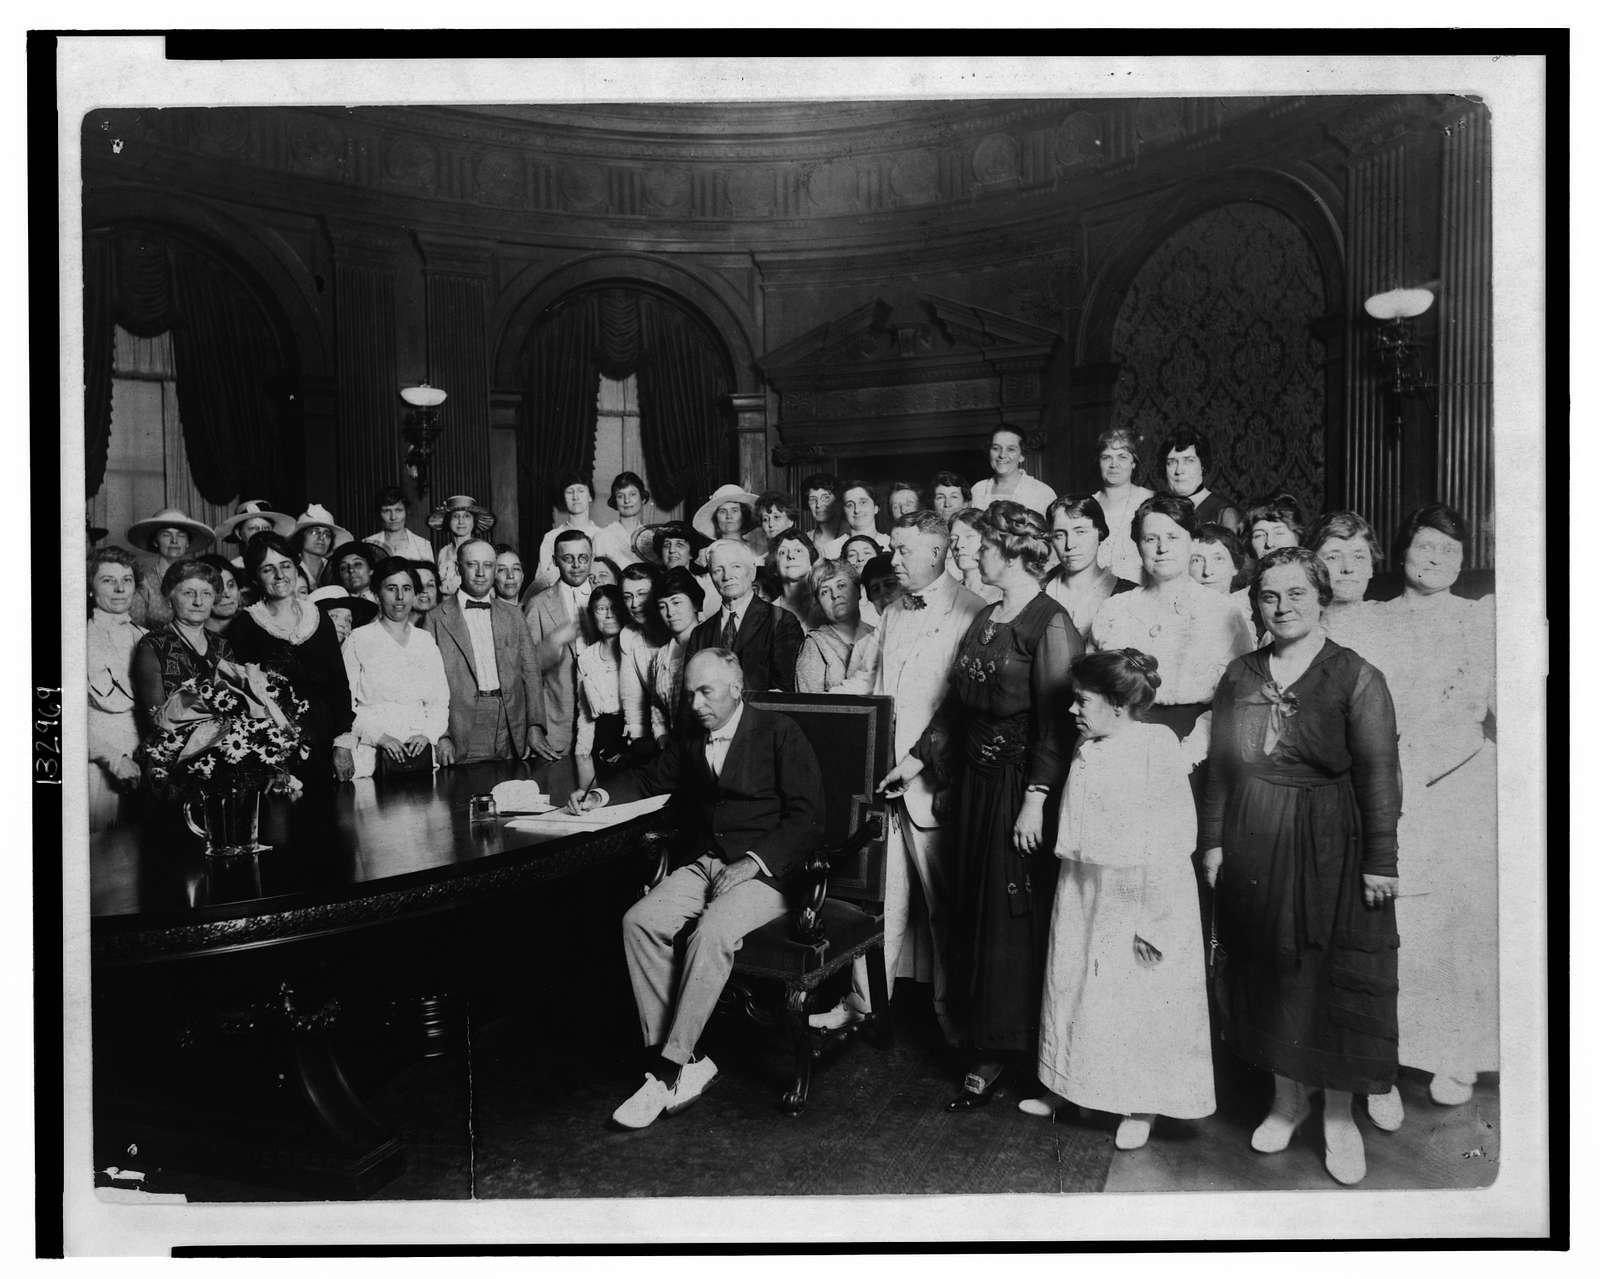 Gov. Gardner signing resolution ratifying amendment to U.S. Constitution granting universal franchise to women / Carl Deeg.